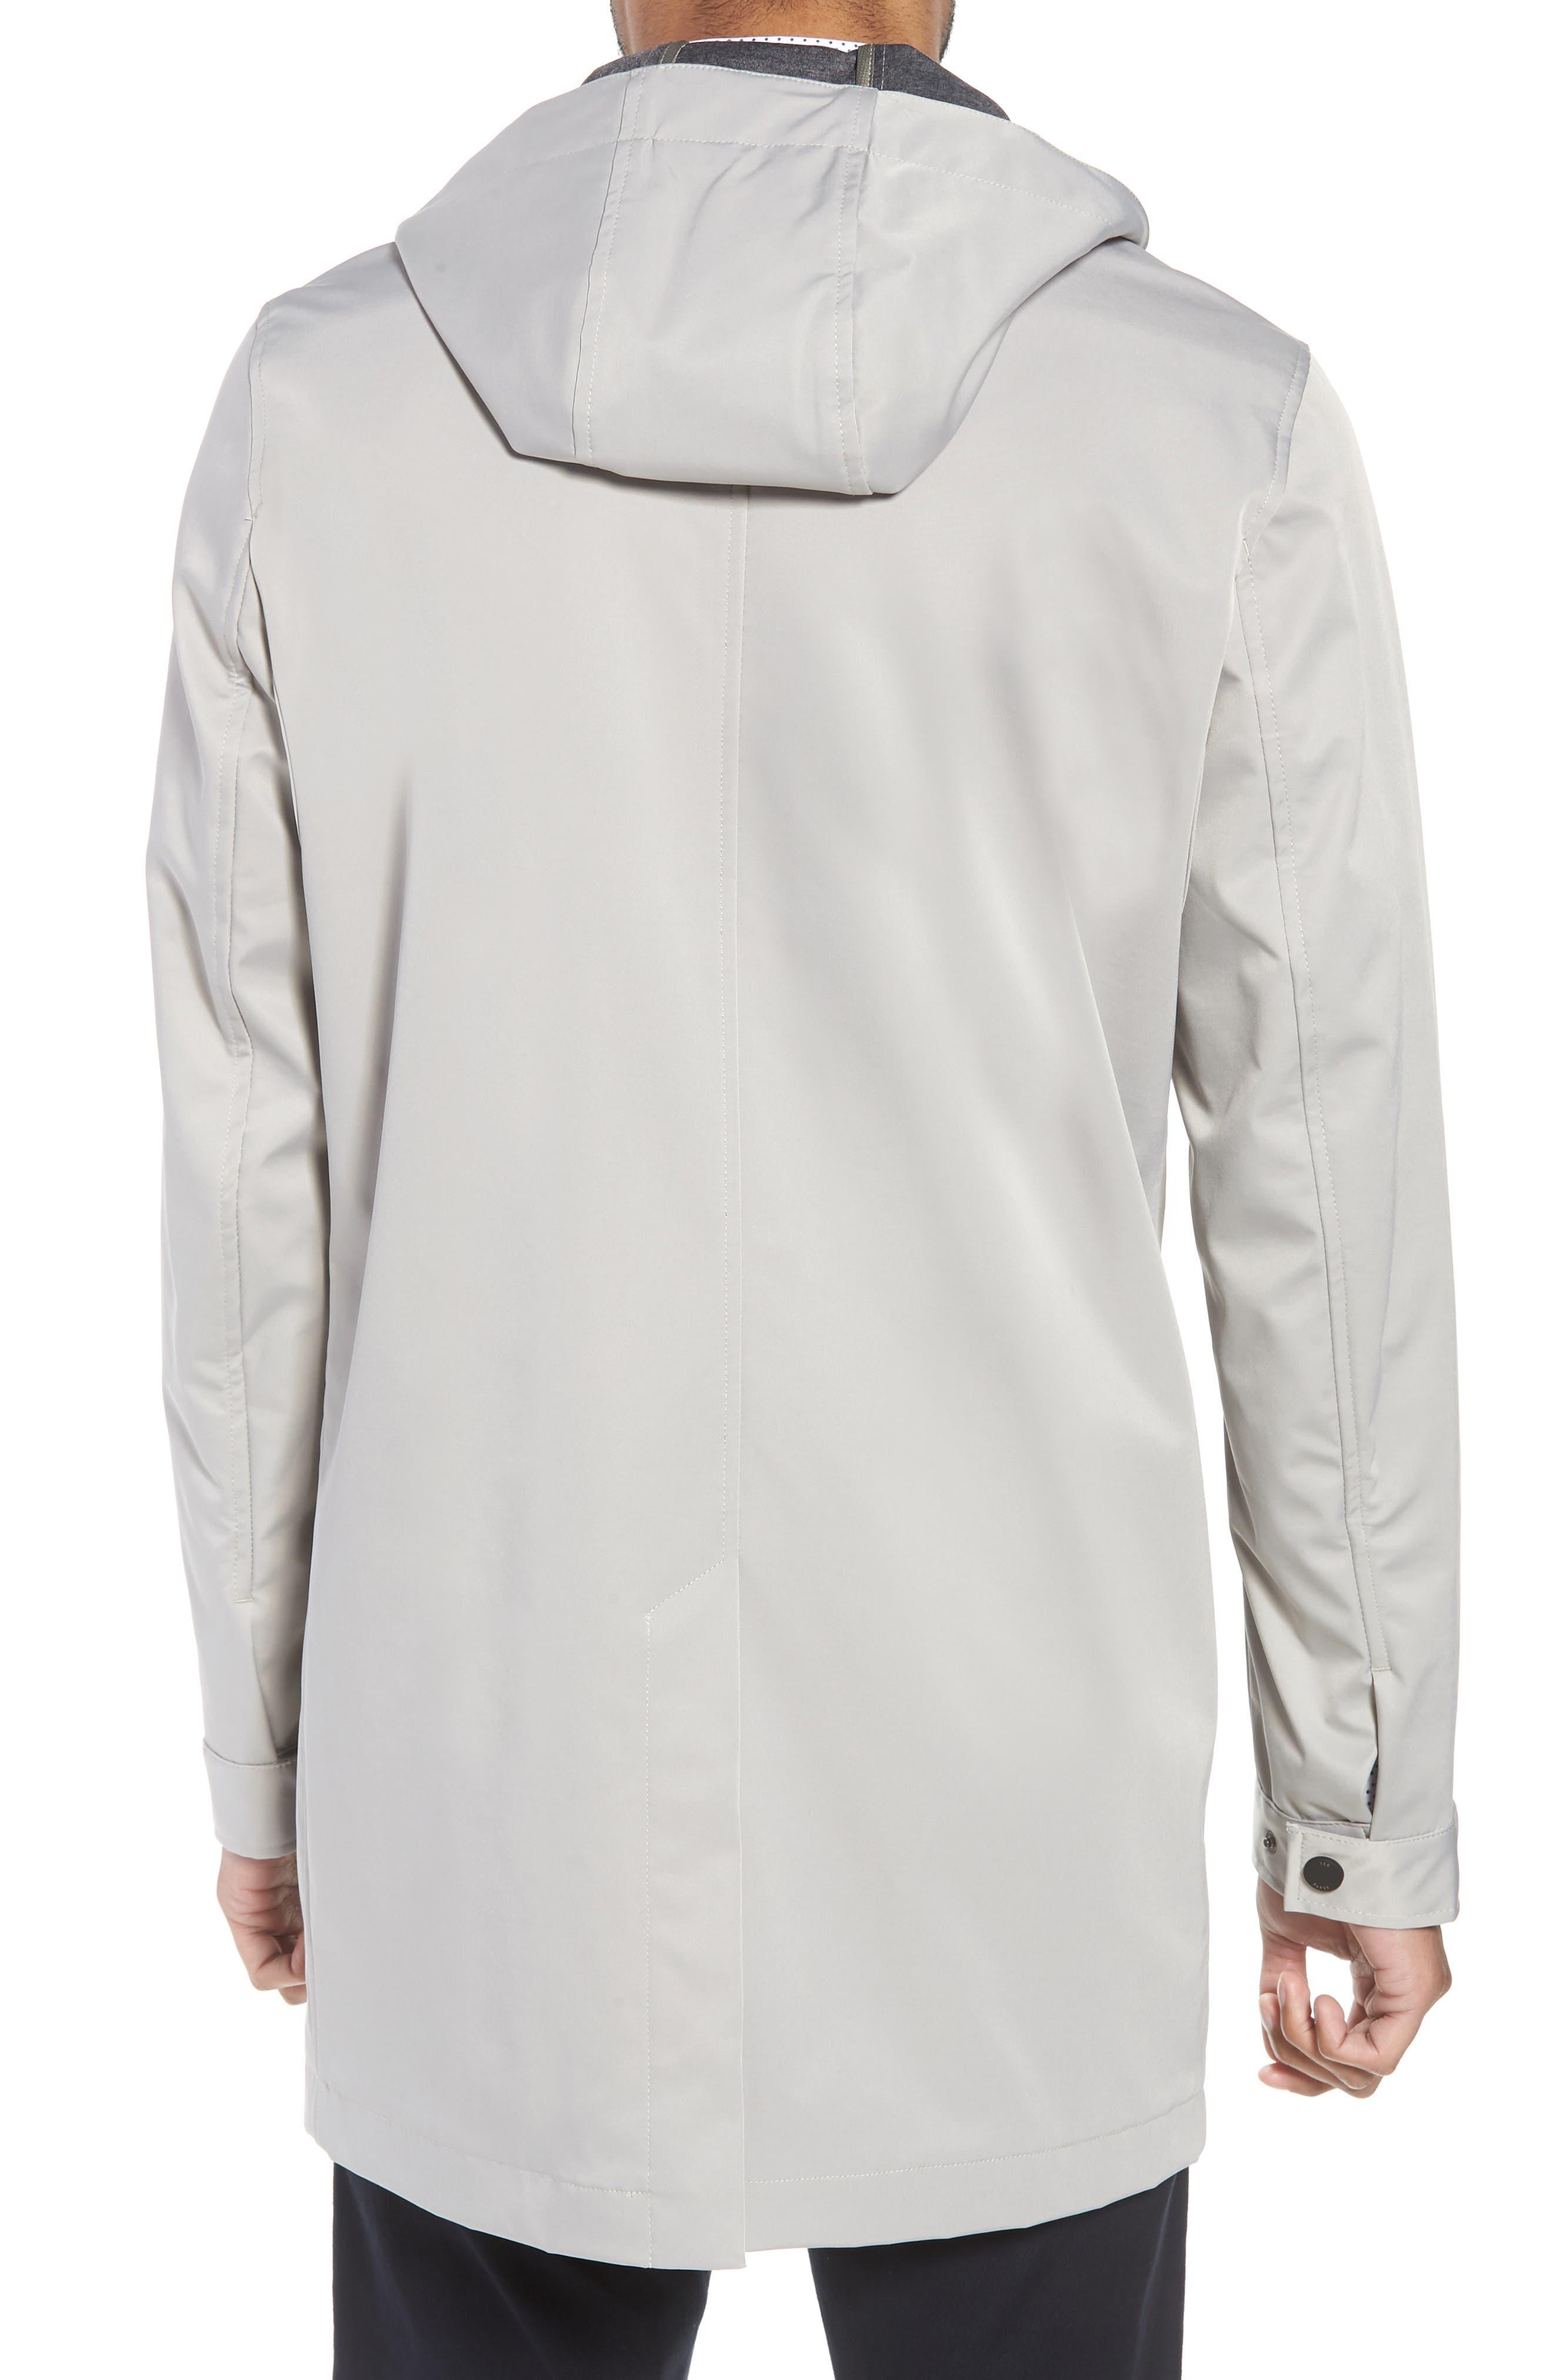 Verner Hooded Mac Jacket,                             Alternate thumbnail 2, color,                             250